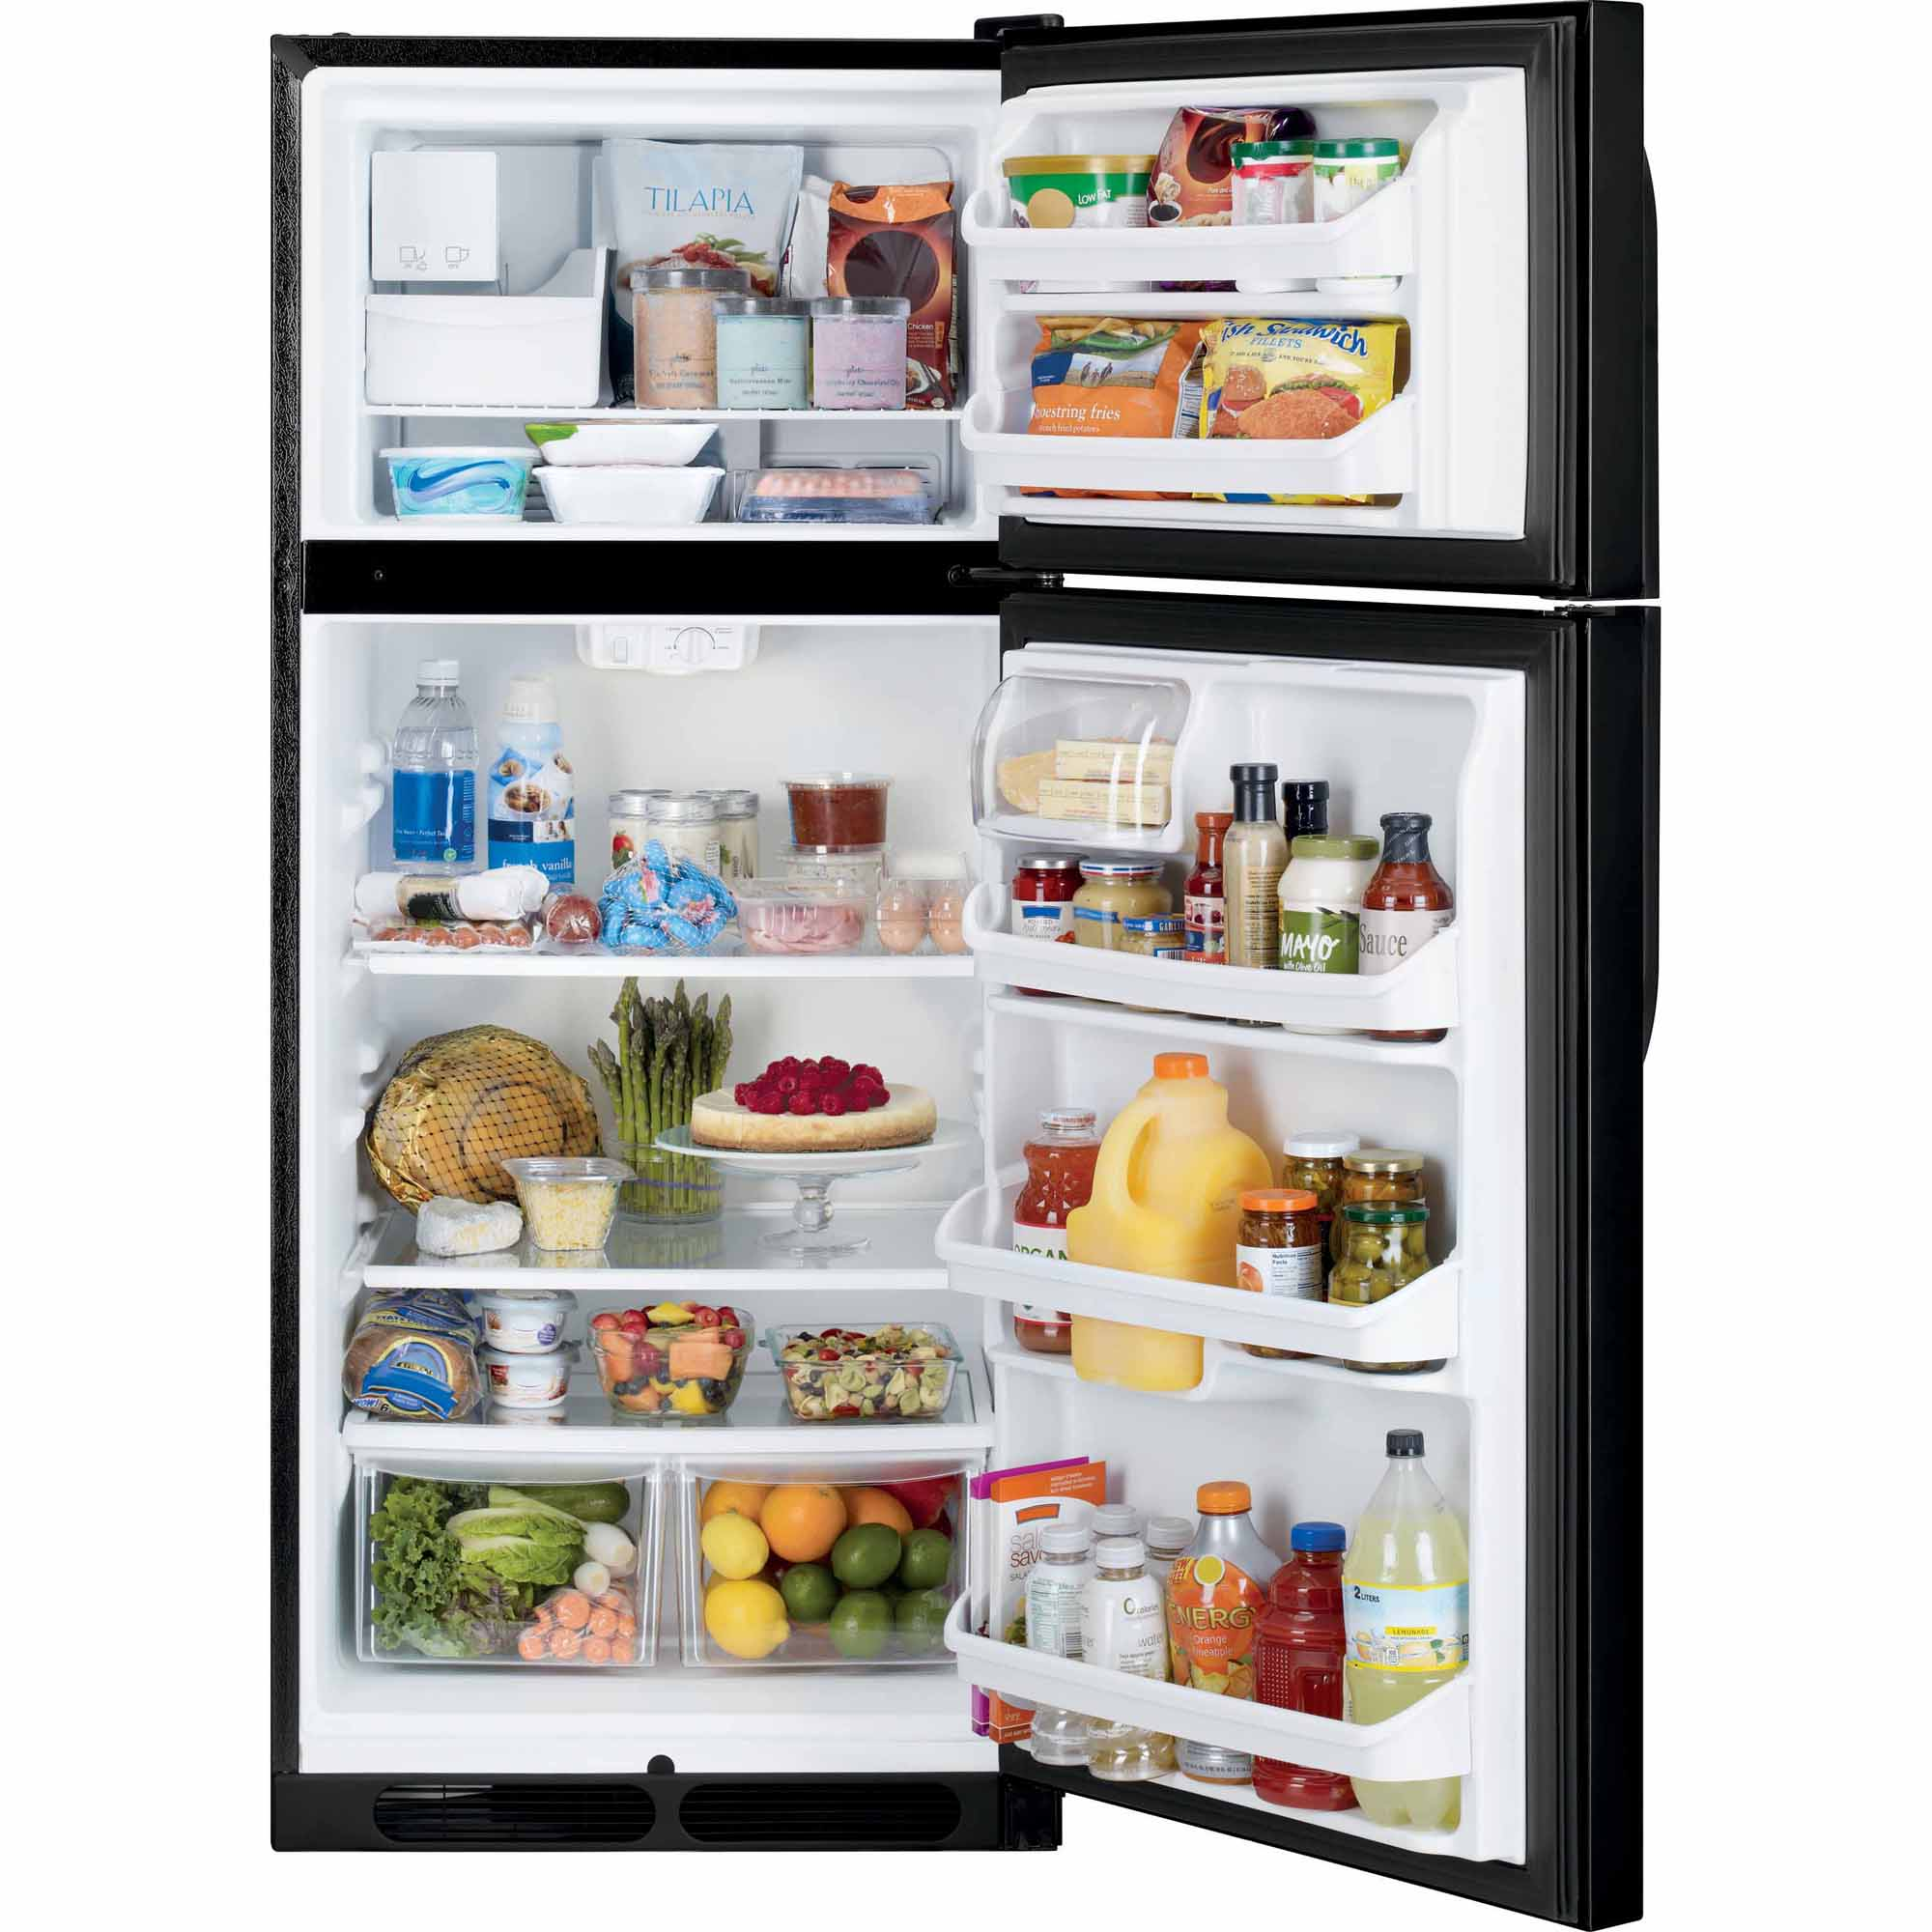 Kenmore 70409 16.3 cu. ft. Top Freezer Refrigerator - Black